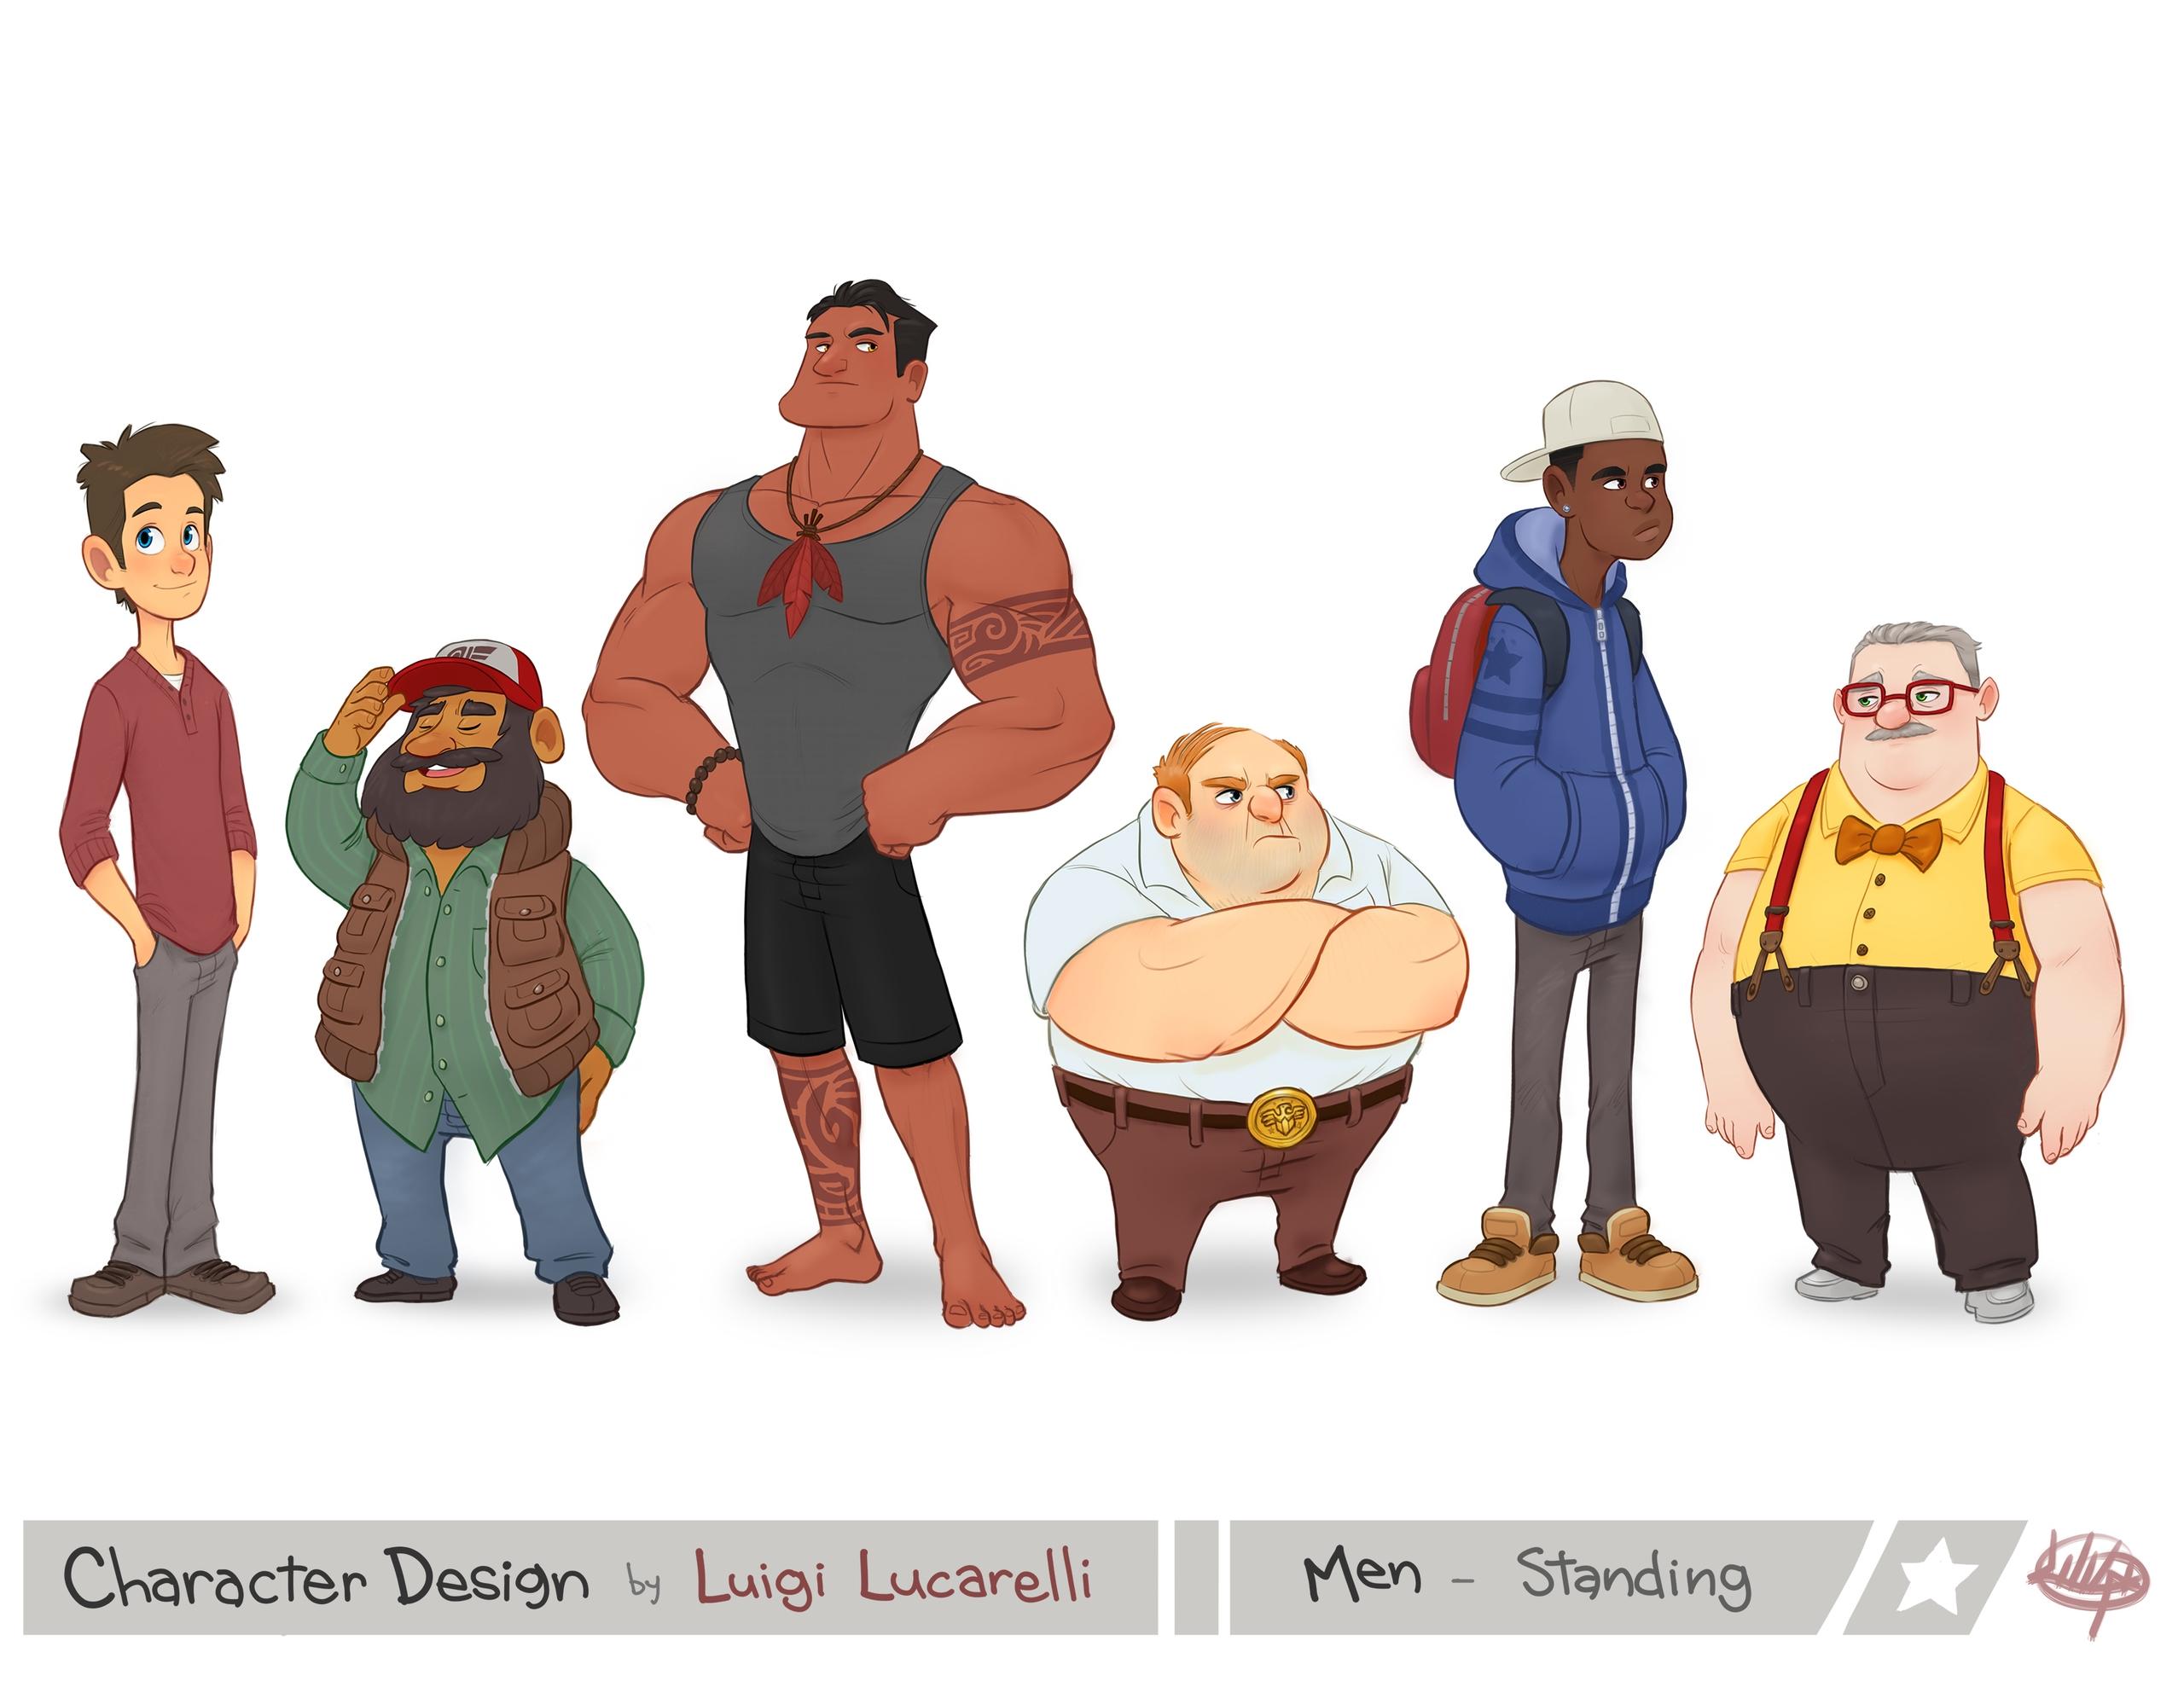 page character design portfolio - luigil-2352 | ello